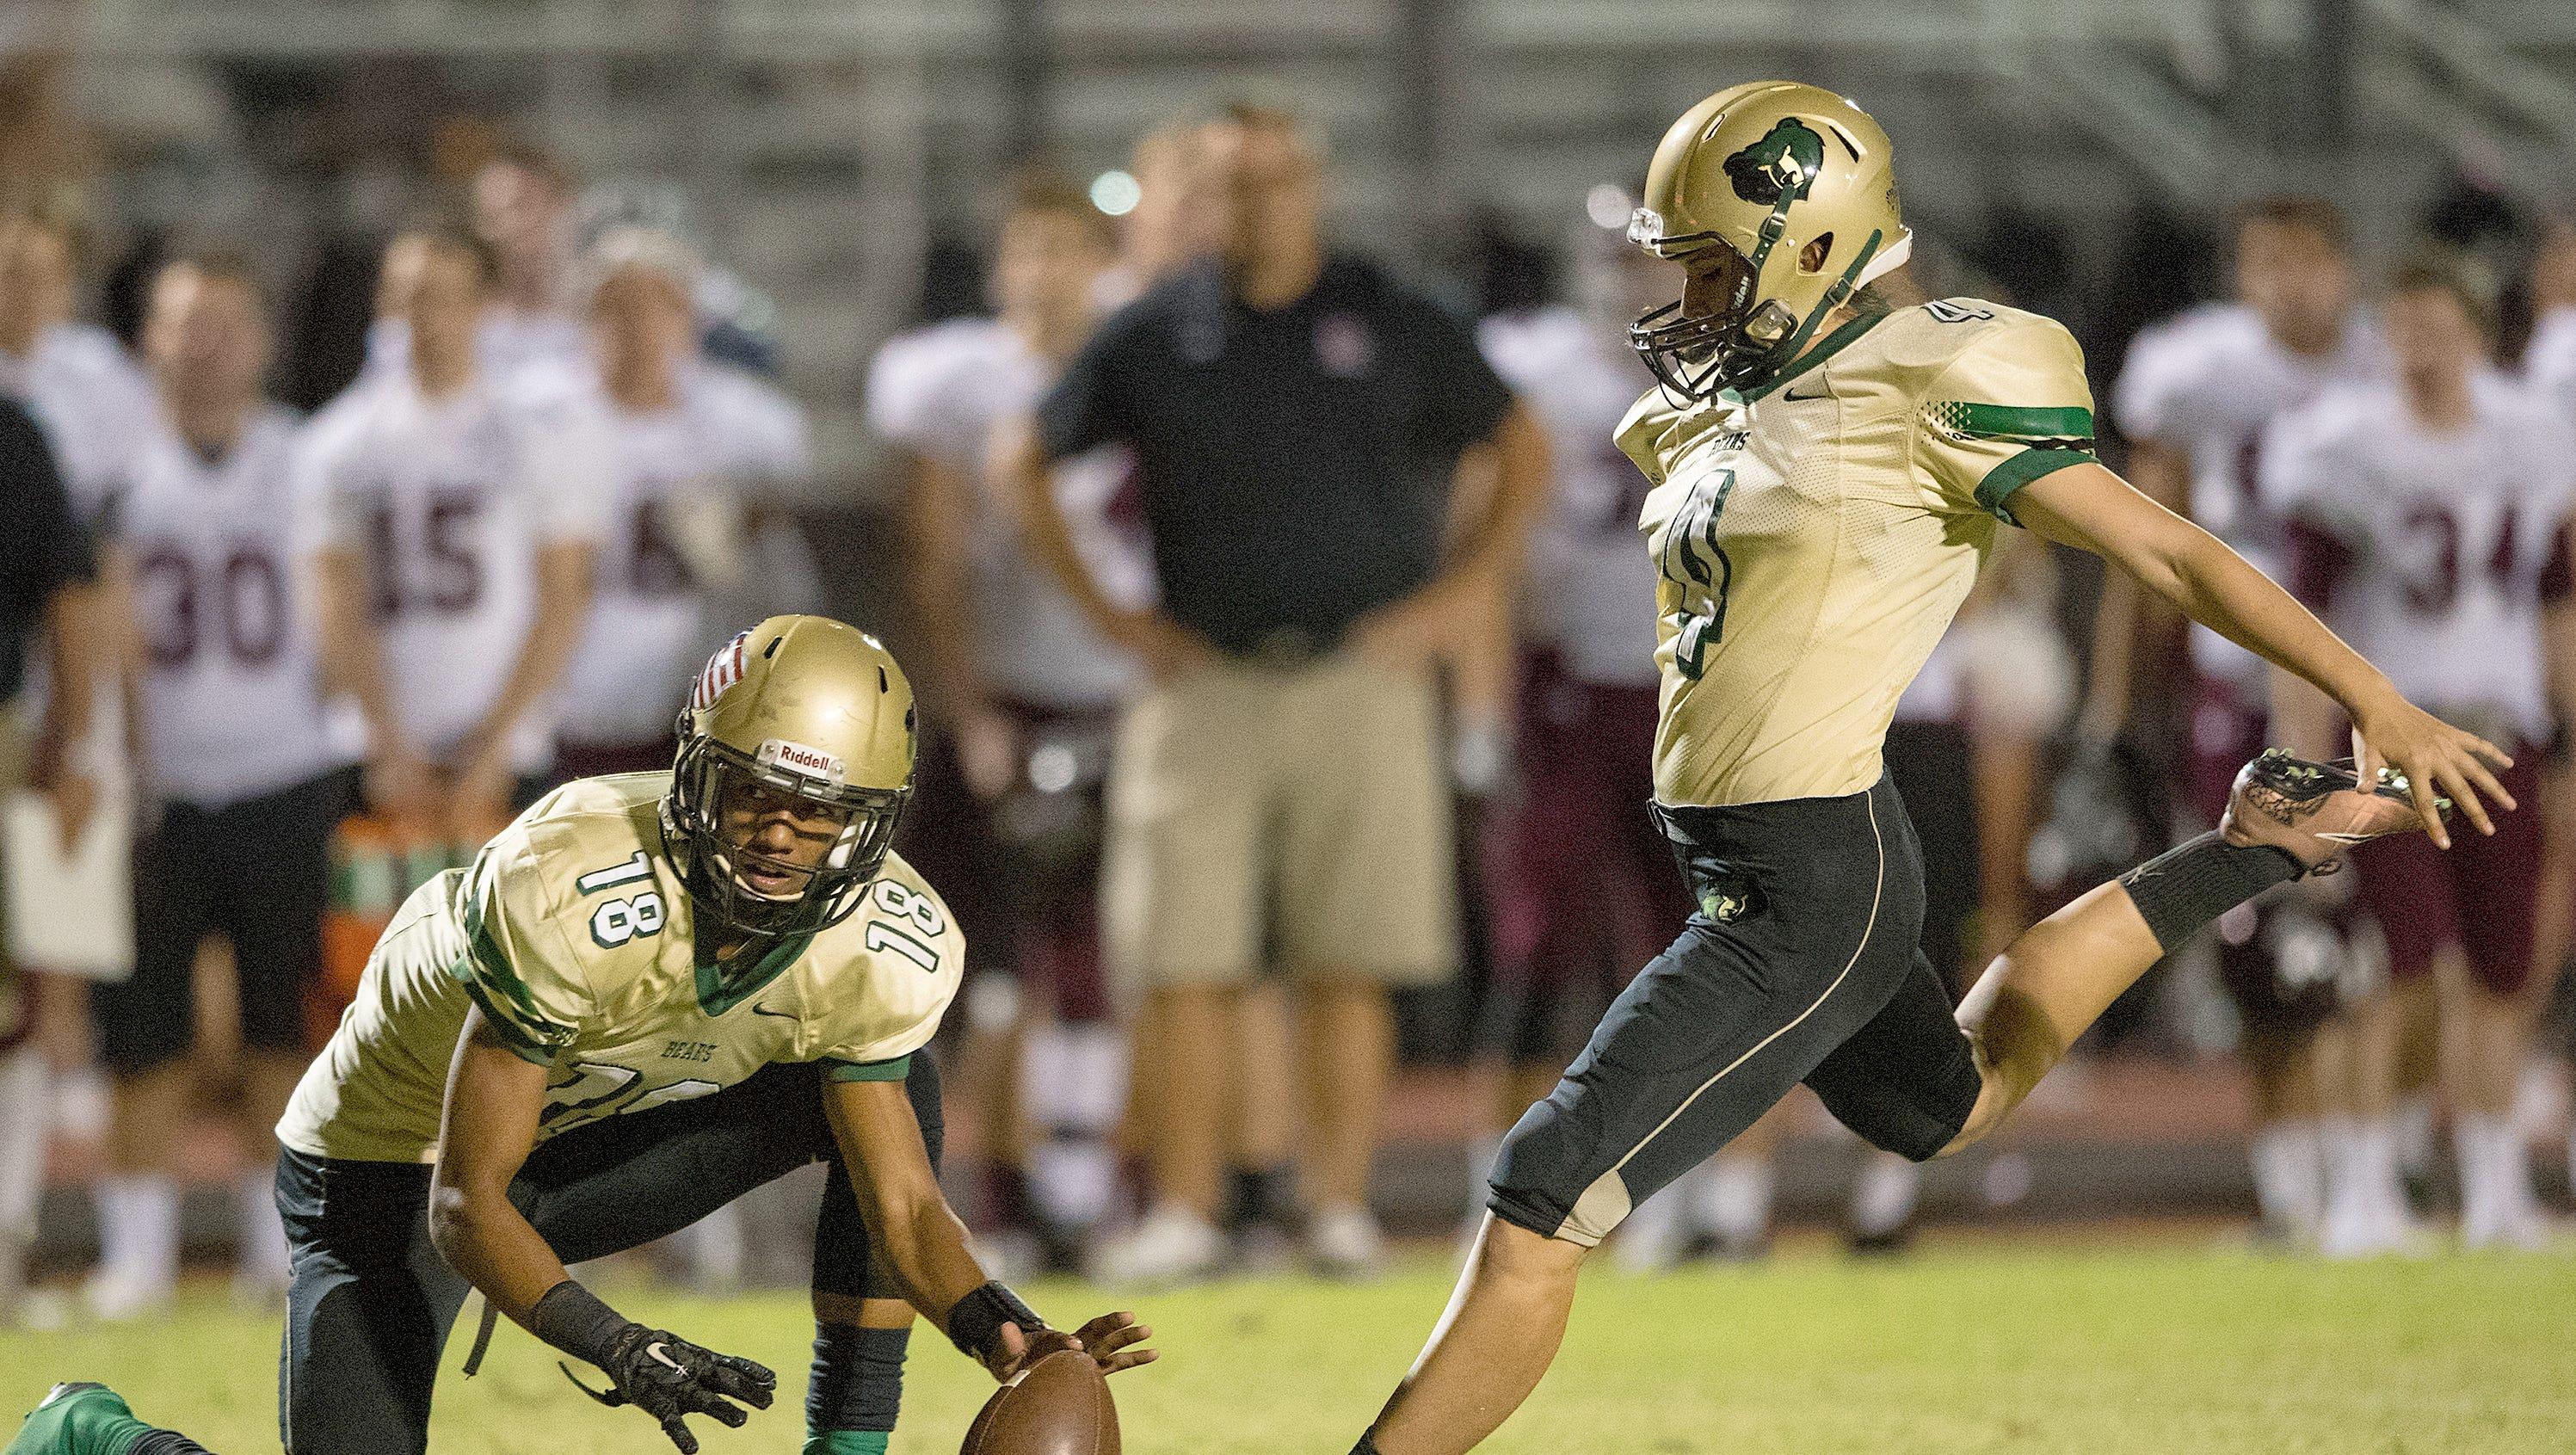 high school kicker becca longo makes college football